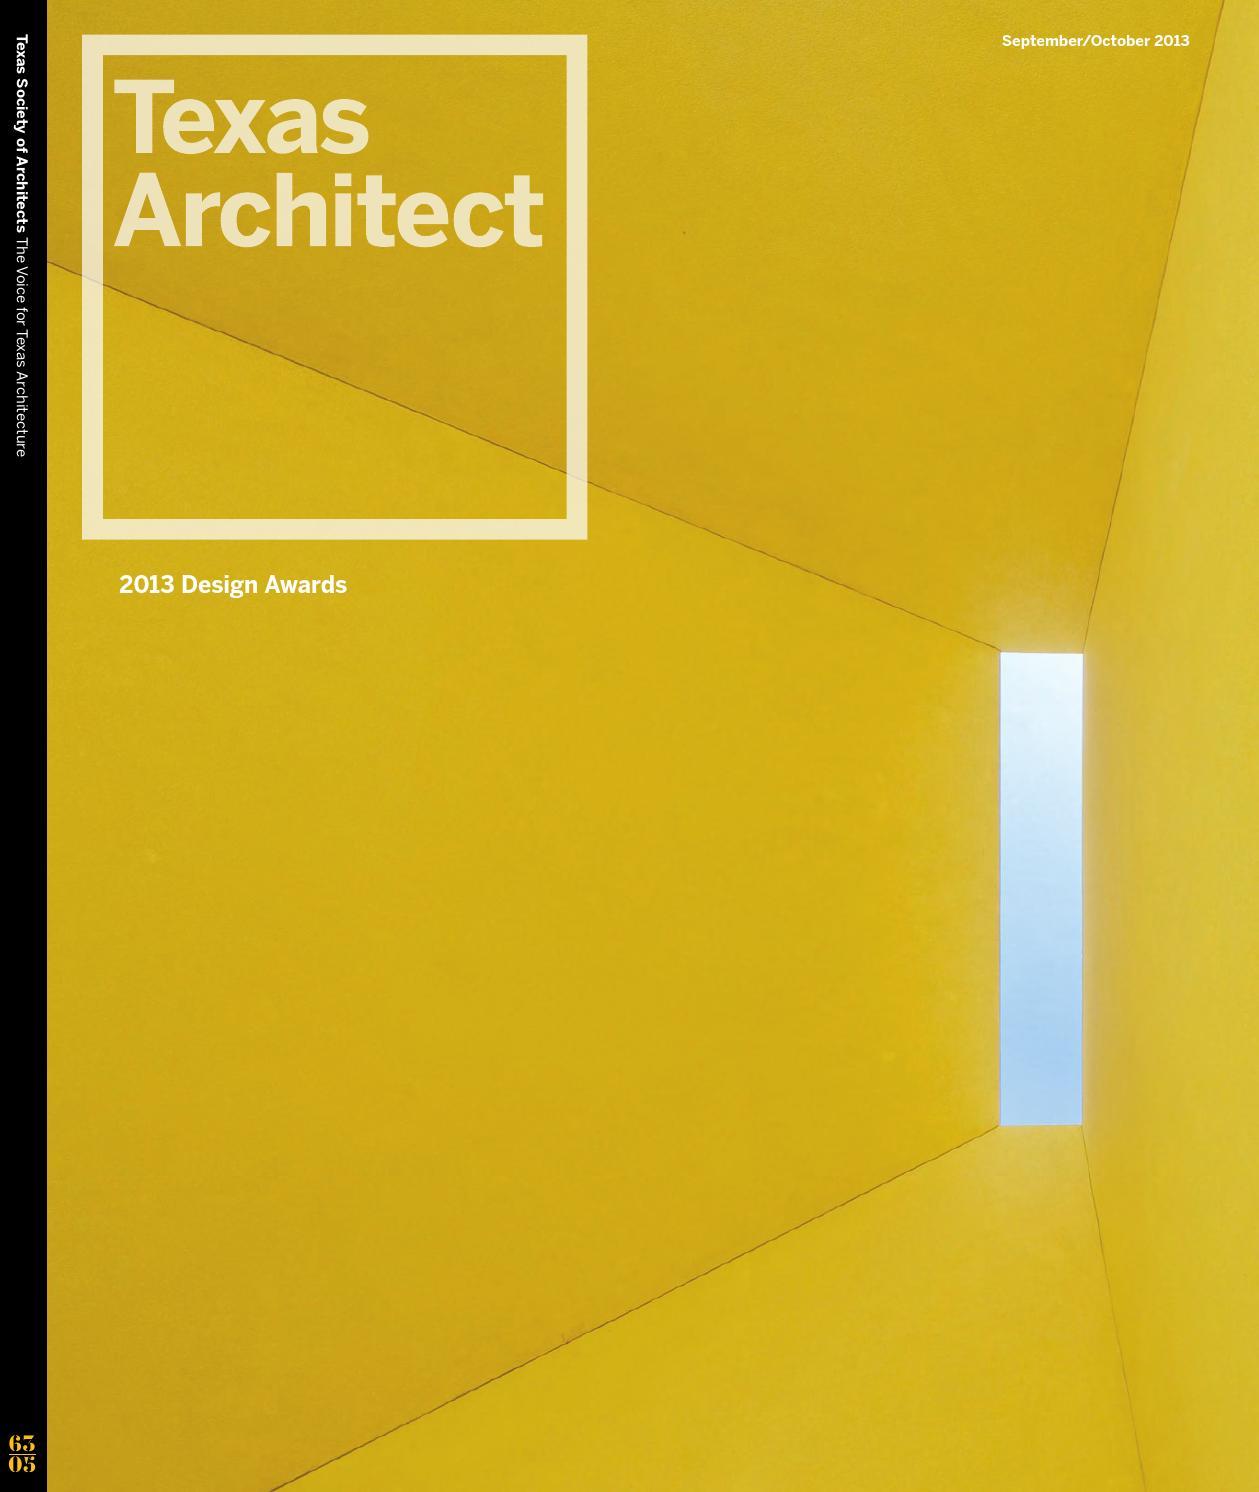 Texas Architect September/October 2013: Design Awards by Texas ...